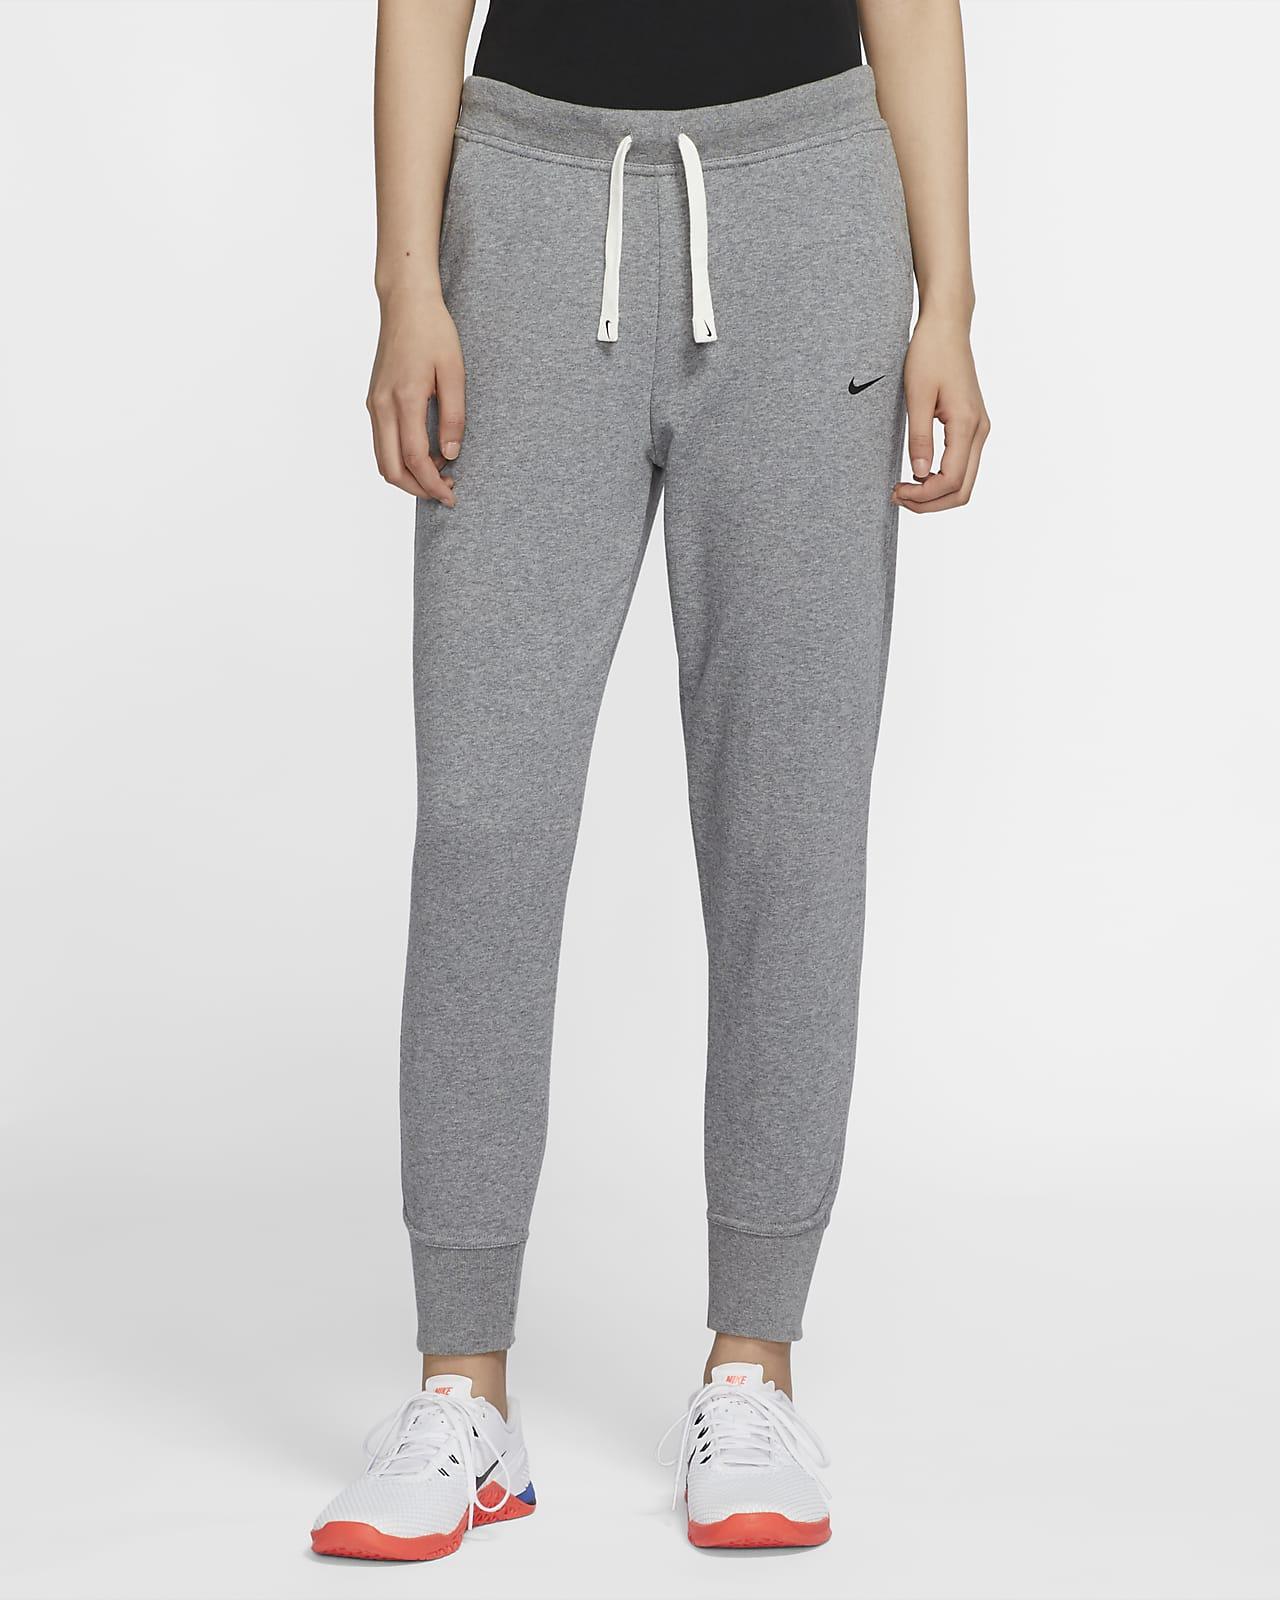 Nike Dri-FIT Get Fit Trainingshose für Damen